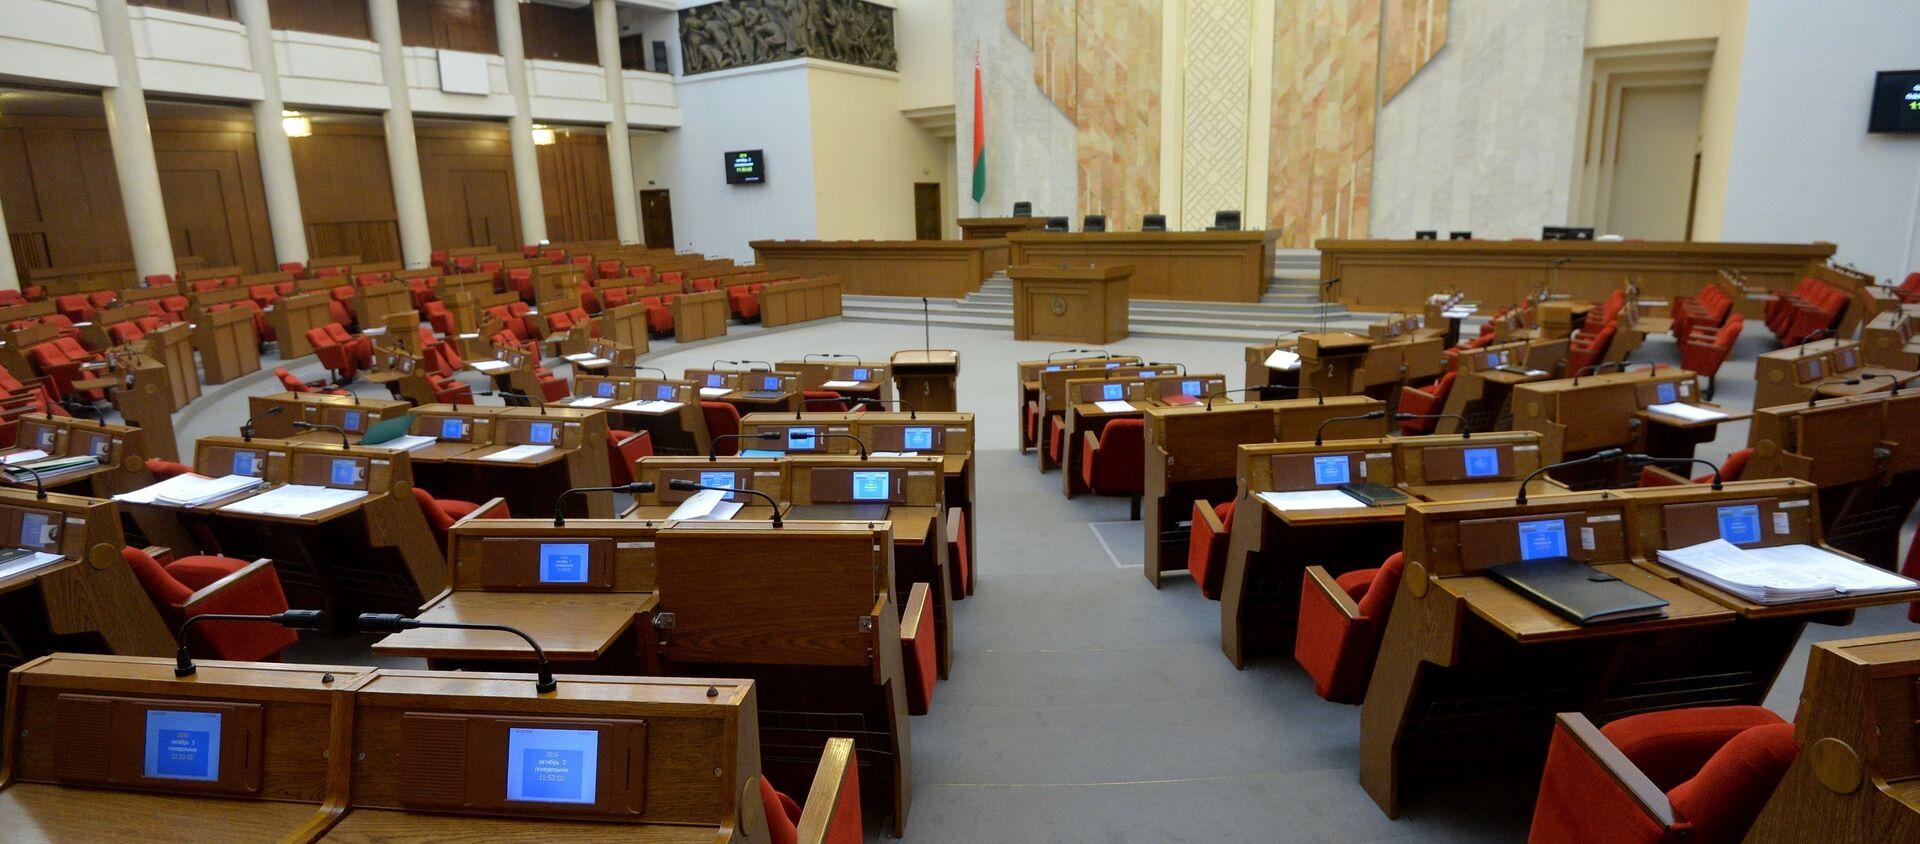 Пустой зал парламента - Sputnik Беларусь, 1920, 23.03.2021